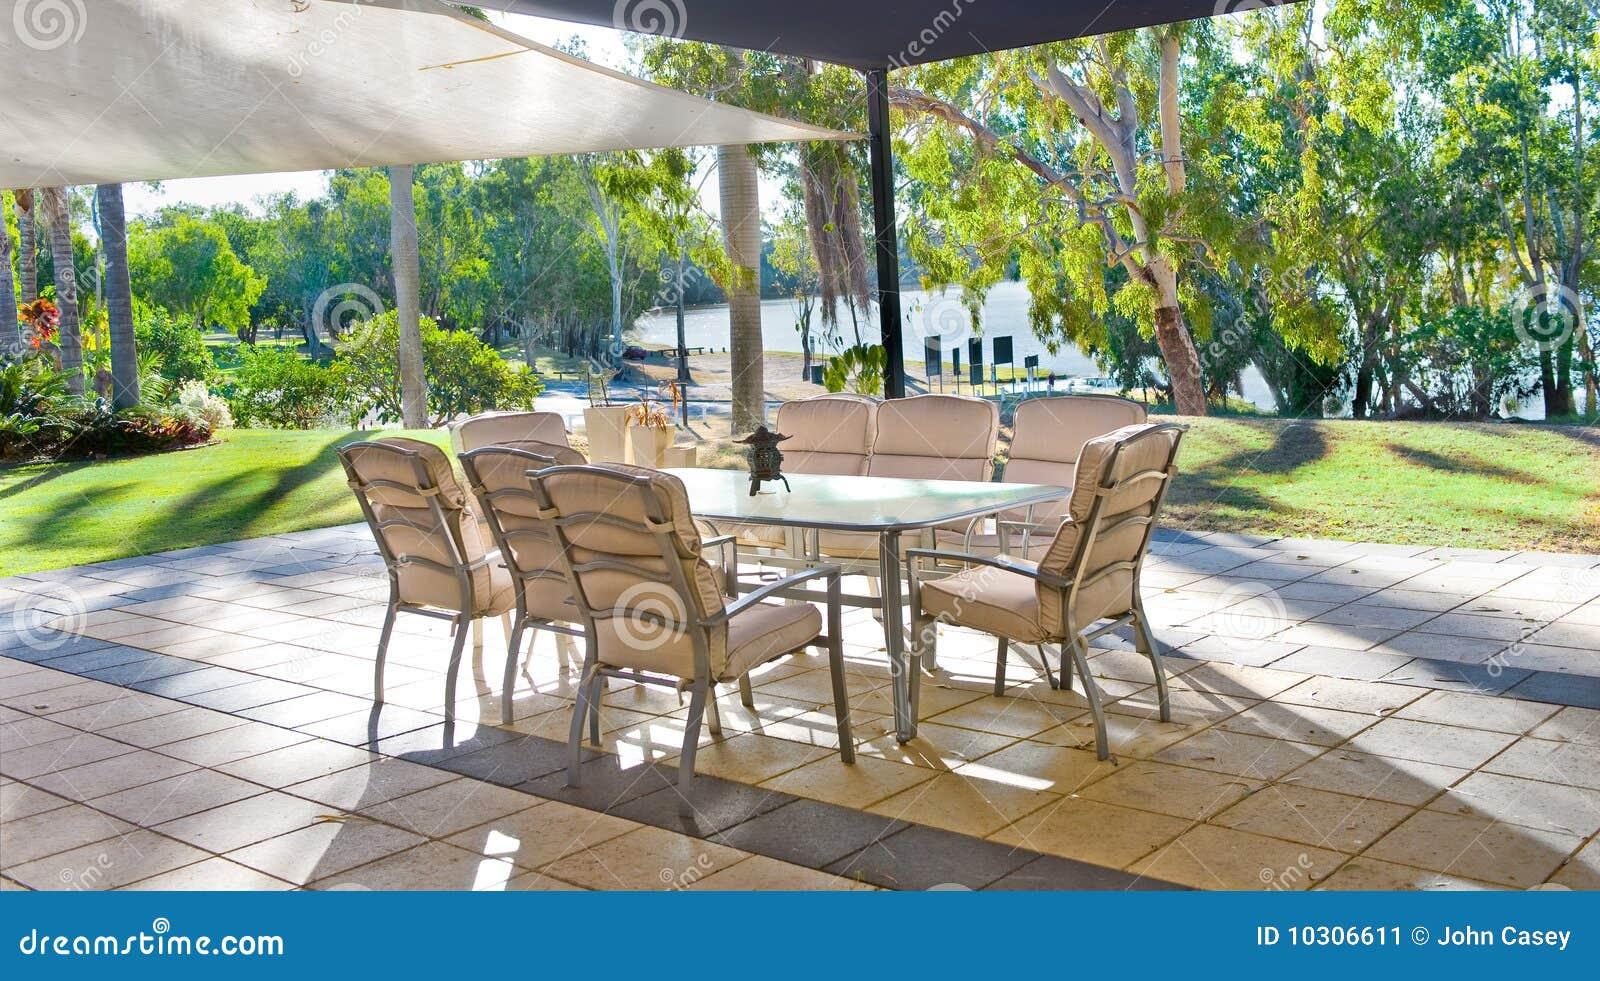 Tropical Backyard Garden Setting Stock Image Image 10306611 : tropical backyard garden setting 10306611 from www.dreamstime.com size 1300 x 814 jpeg 1358kB